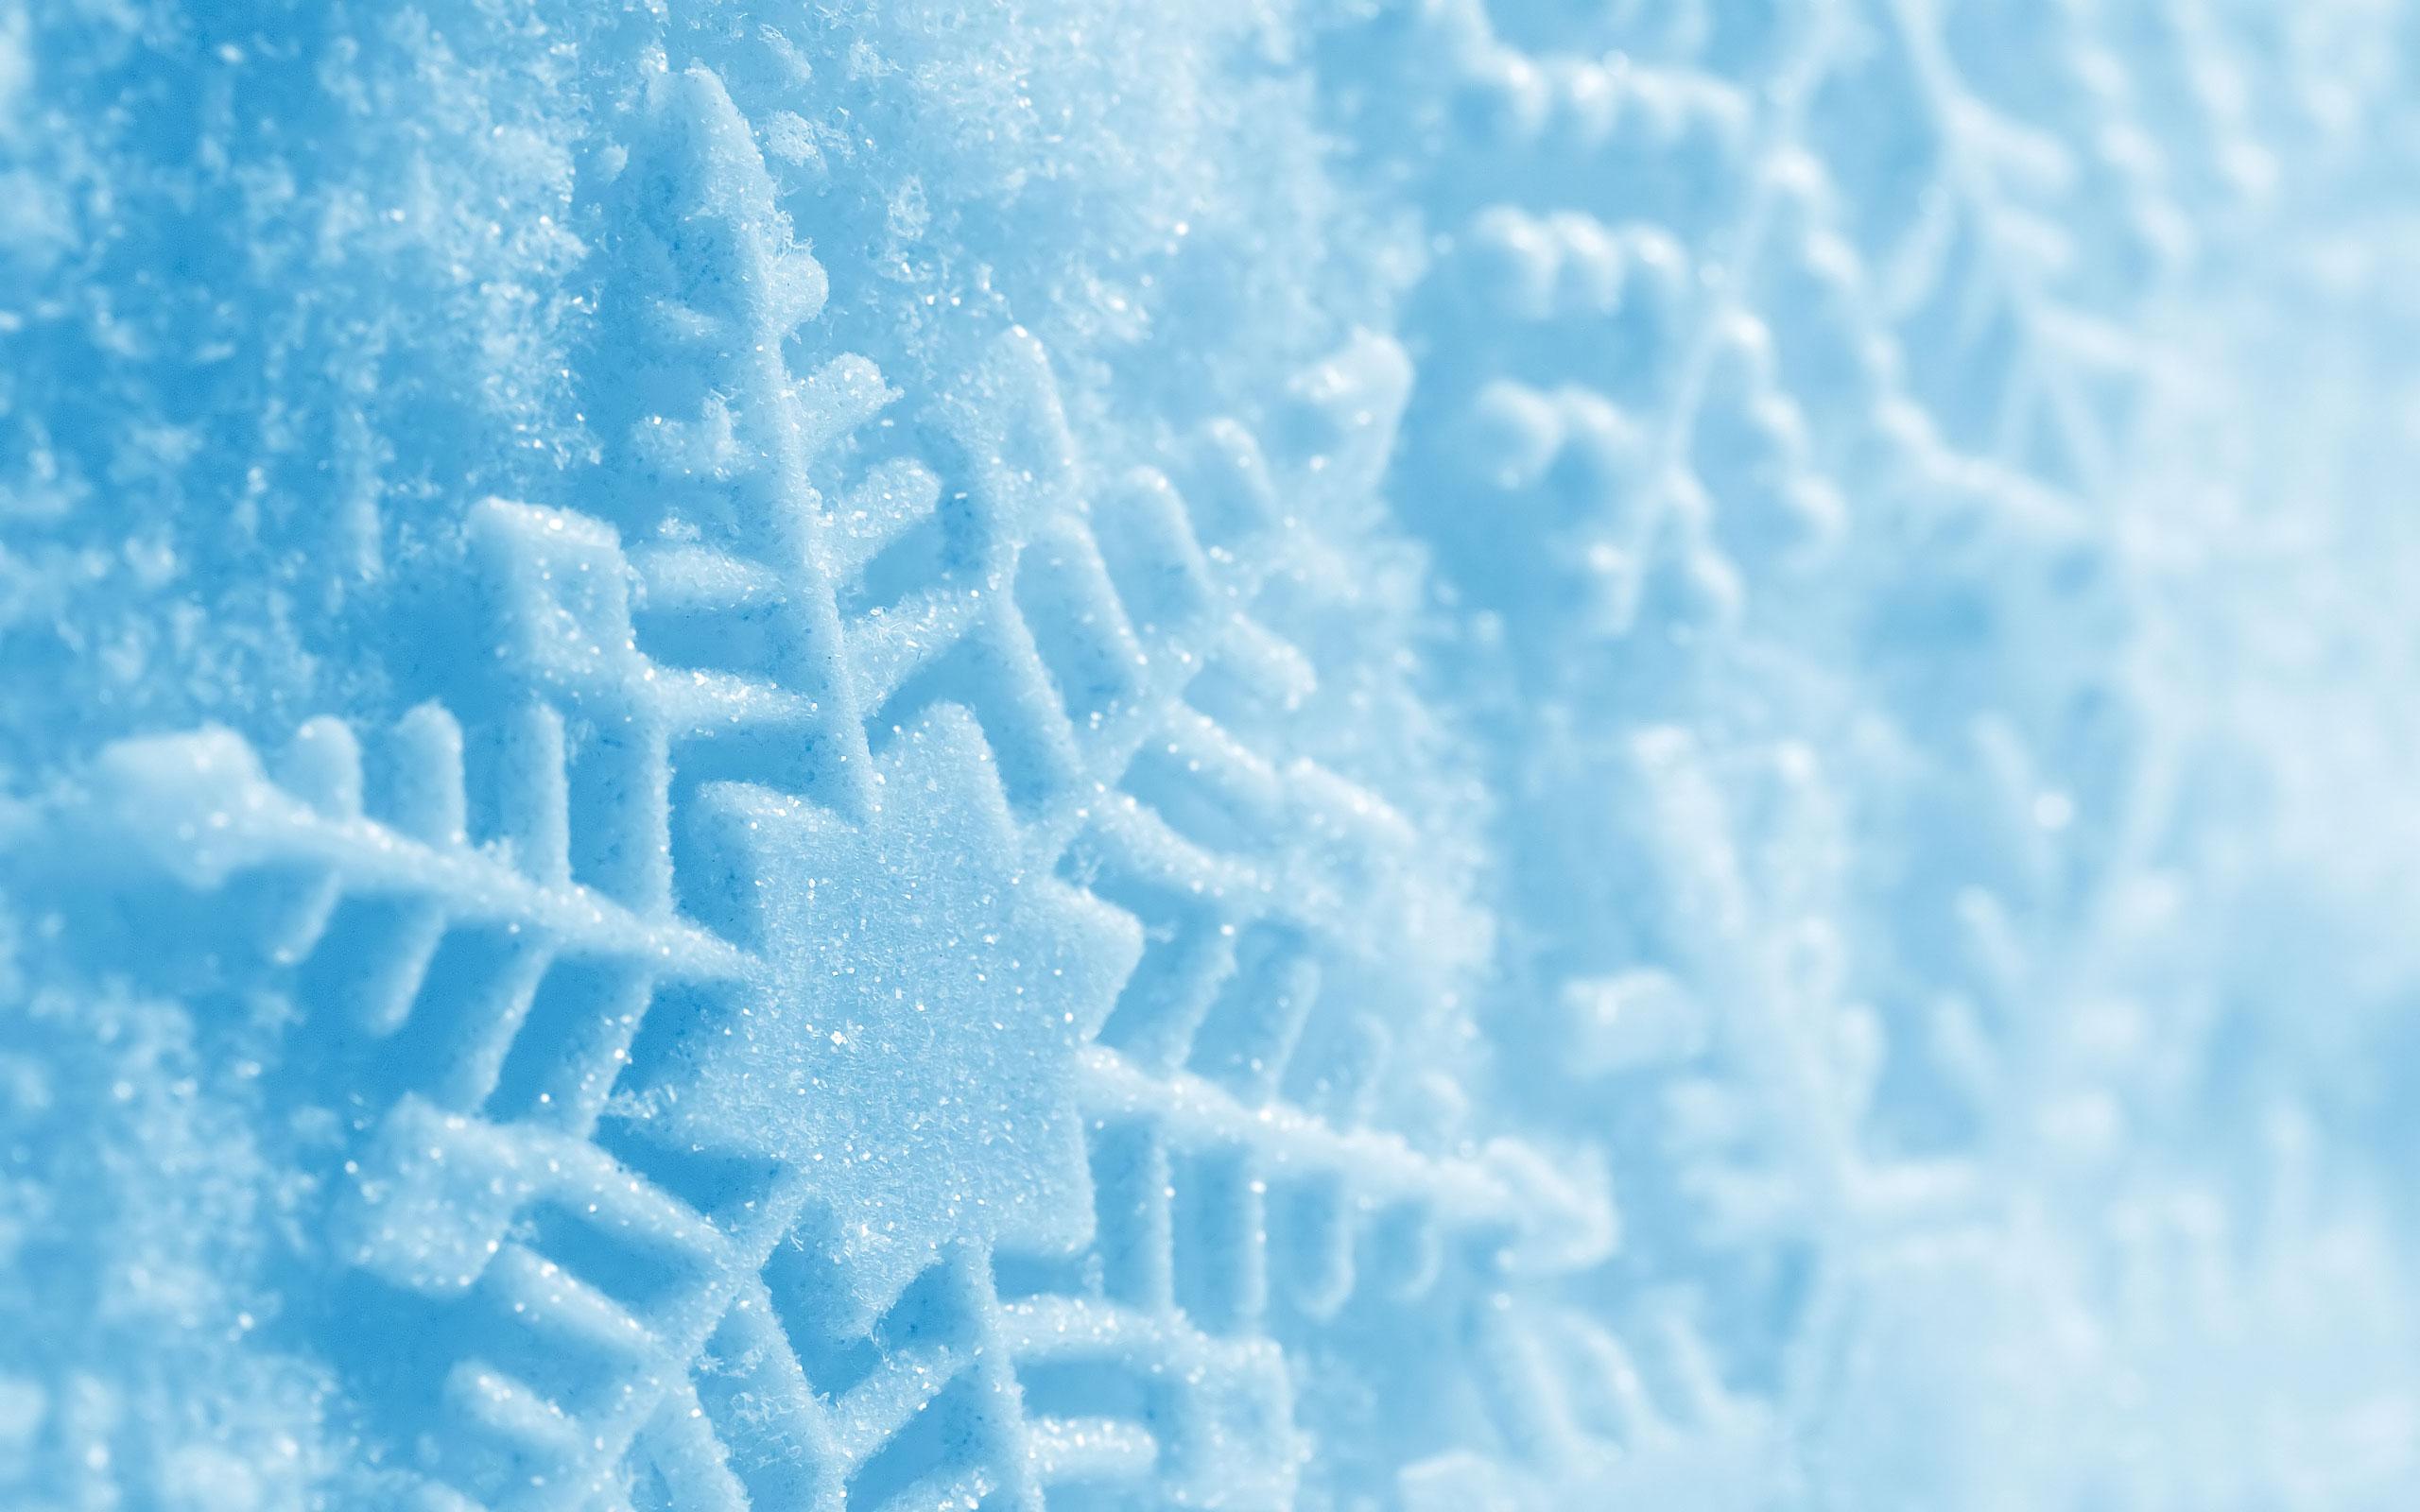 Snow Background wallpaper Snow Background hd wallpaper background 2560x1600